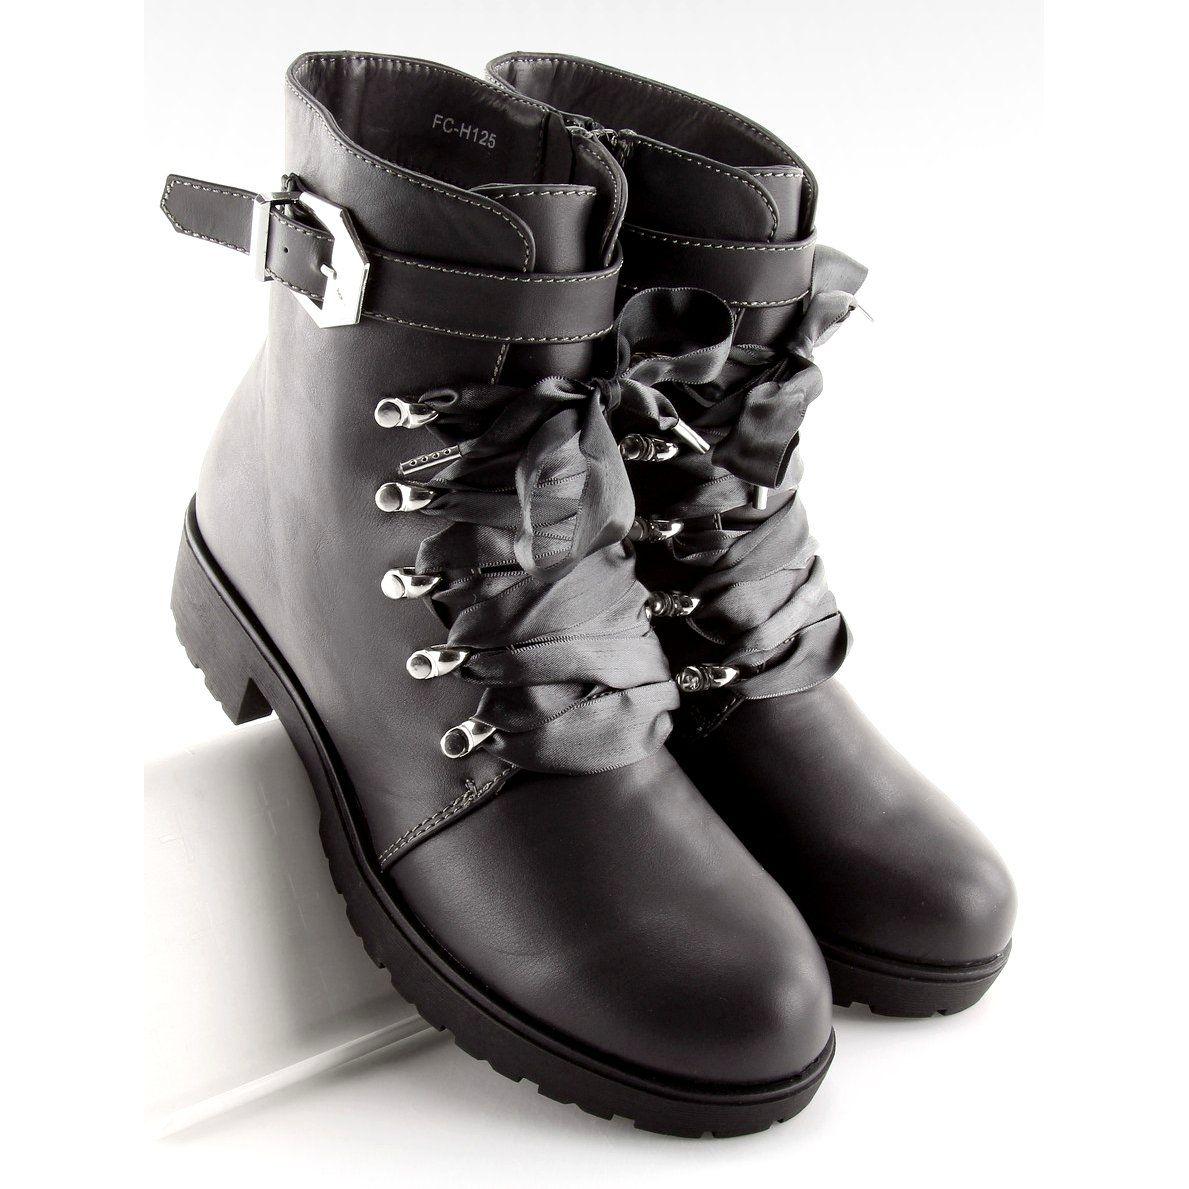 499a1ef33038e Botki glany wstążka szare FC-H125 Grey   Botki damskie   Shoes ...